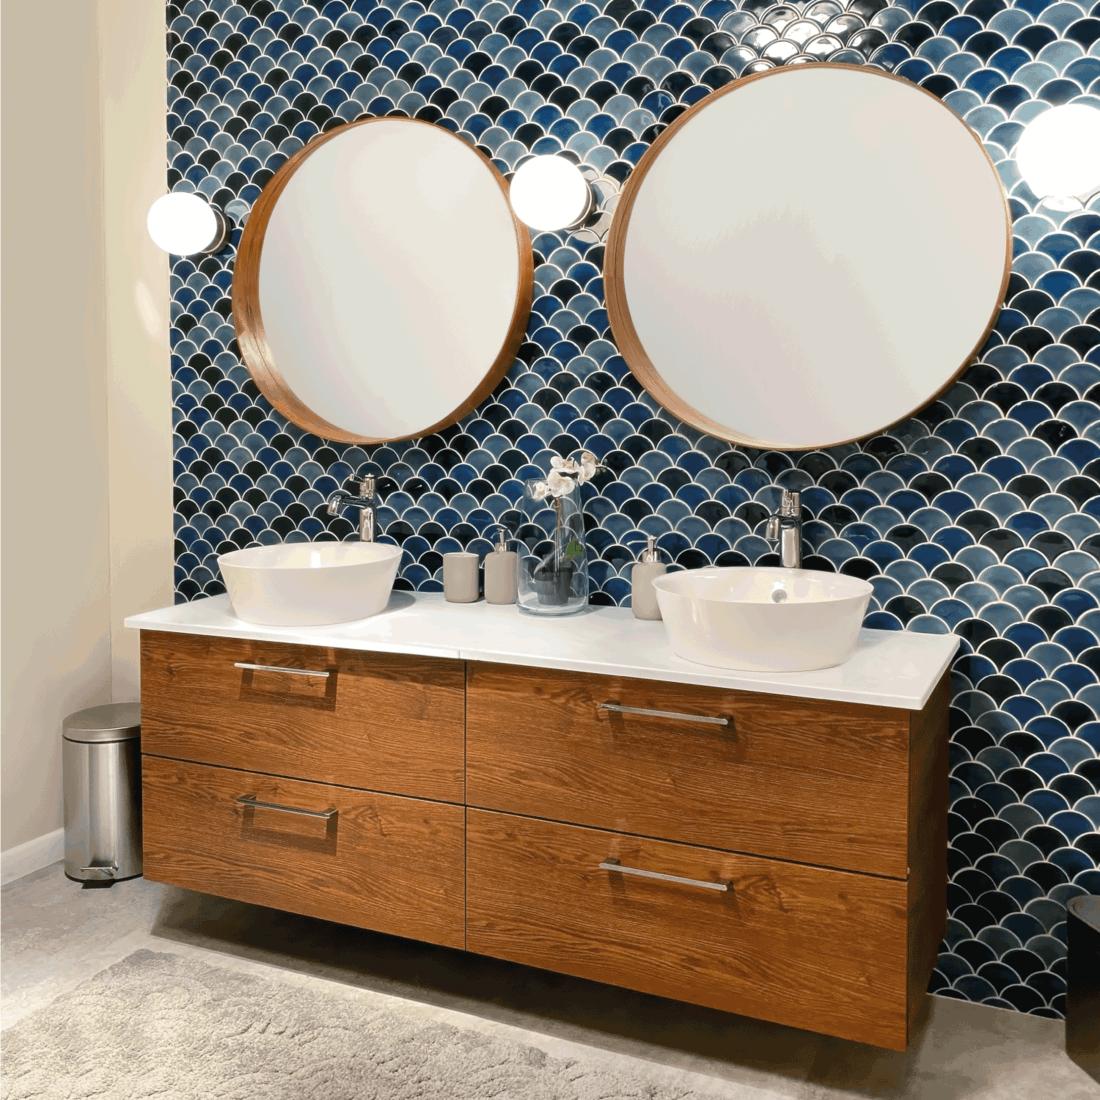 Modern bathroom with double vanity cabinet